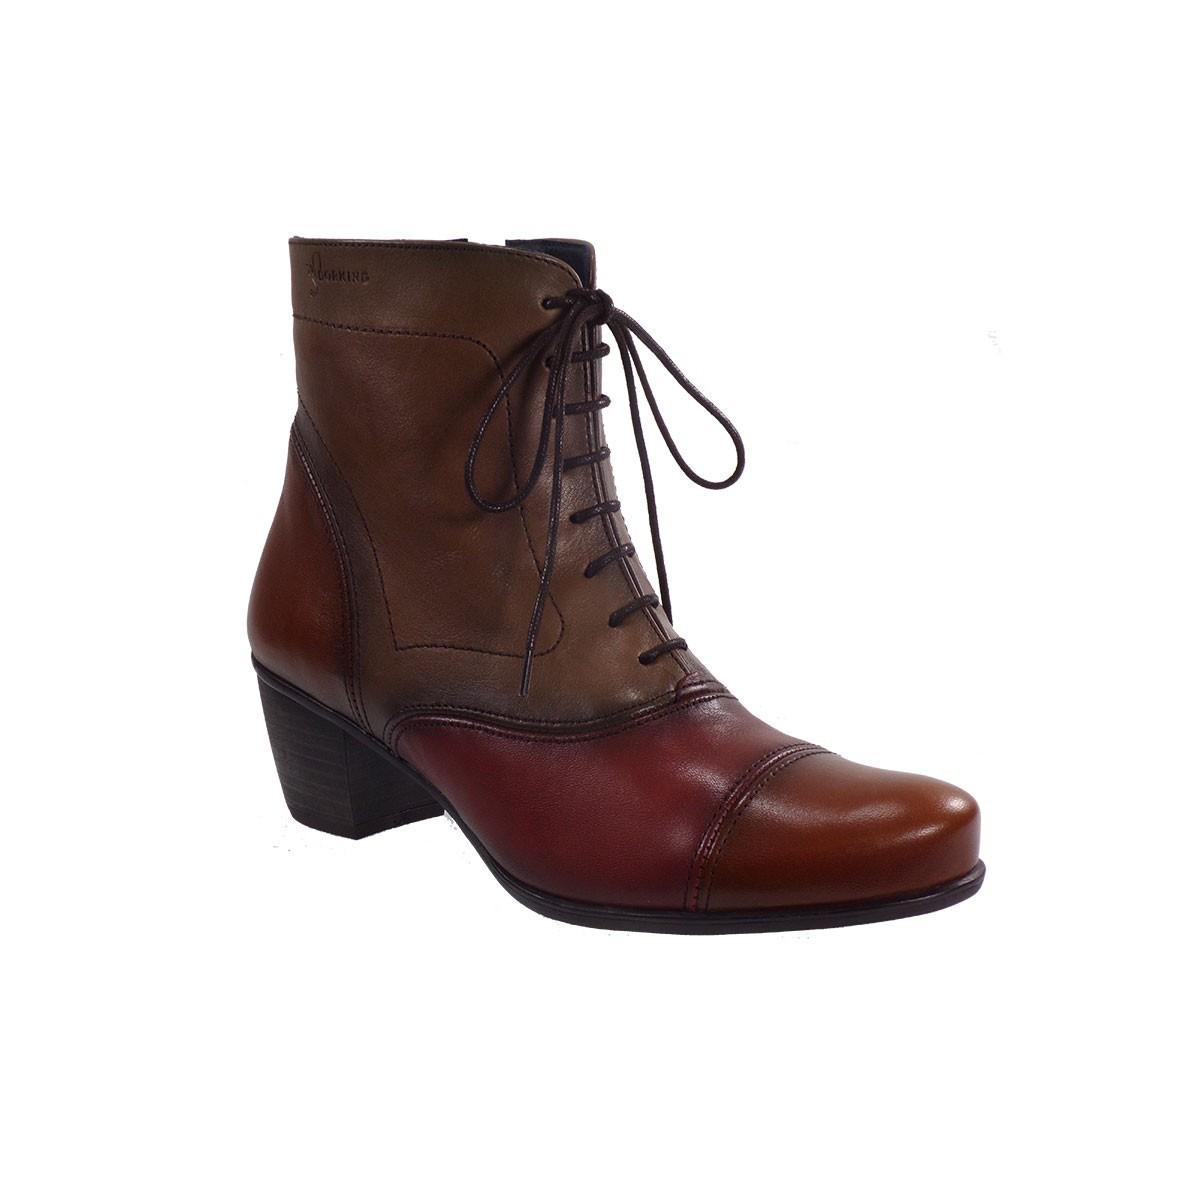 5340d98393b Dorking Γυναικεία Παπούτσια Μποτάκια D72555USSL Ταμπά Δέρμα |Γυναικεία &  Ανδρικά Παπούτσια - BagiotaShoes.gr